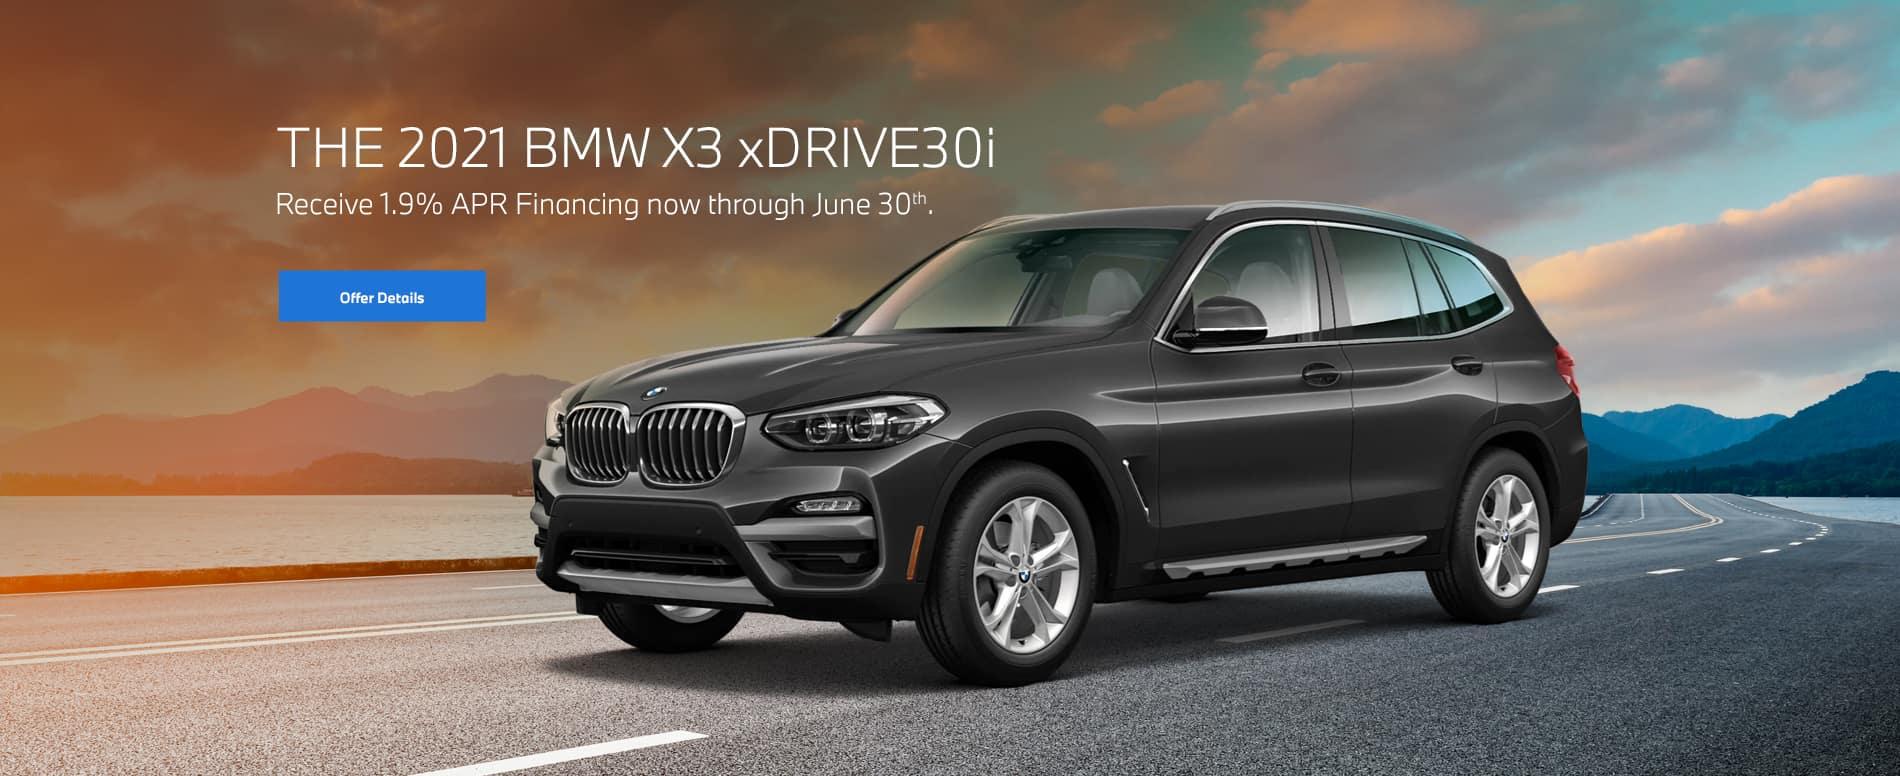 PUSH_BMW_2021_X3_xDrive30i_Finance_1900x776_Desktop